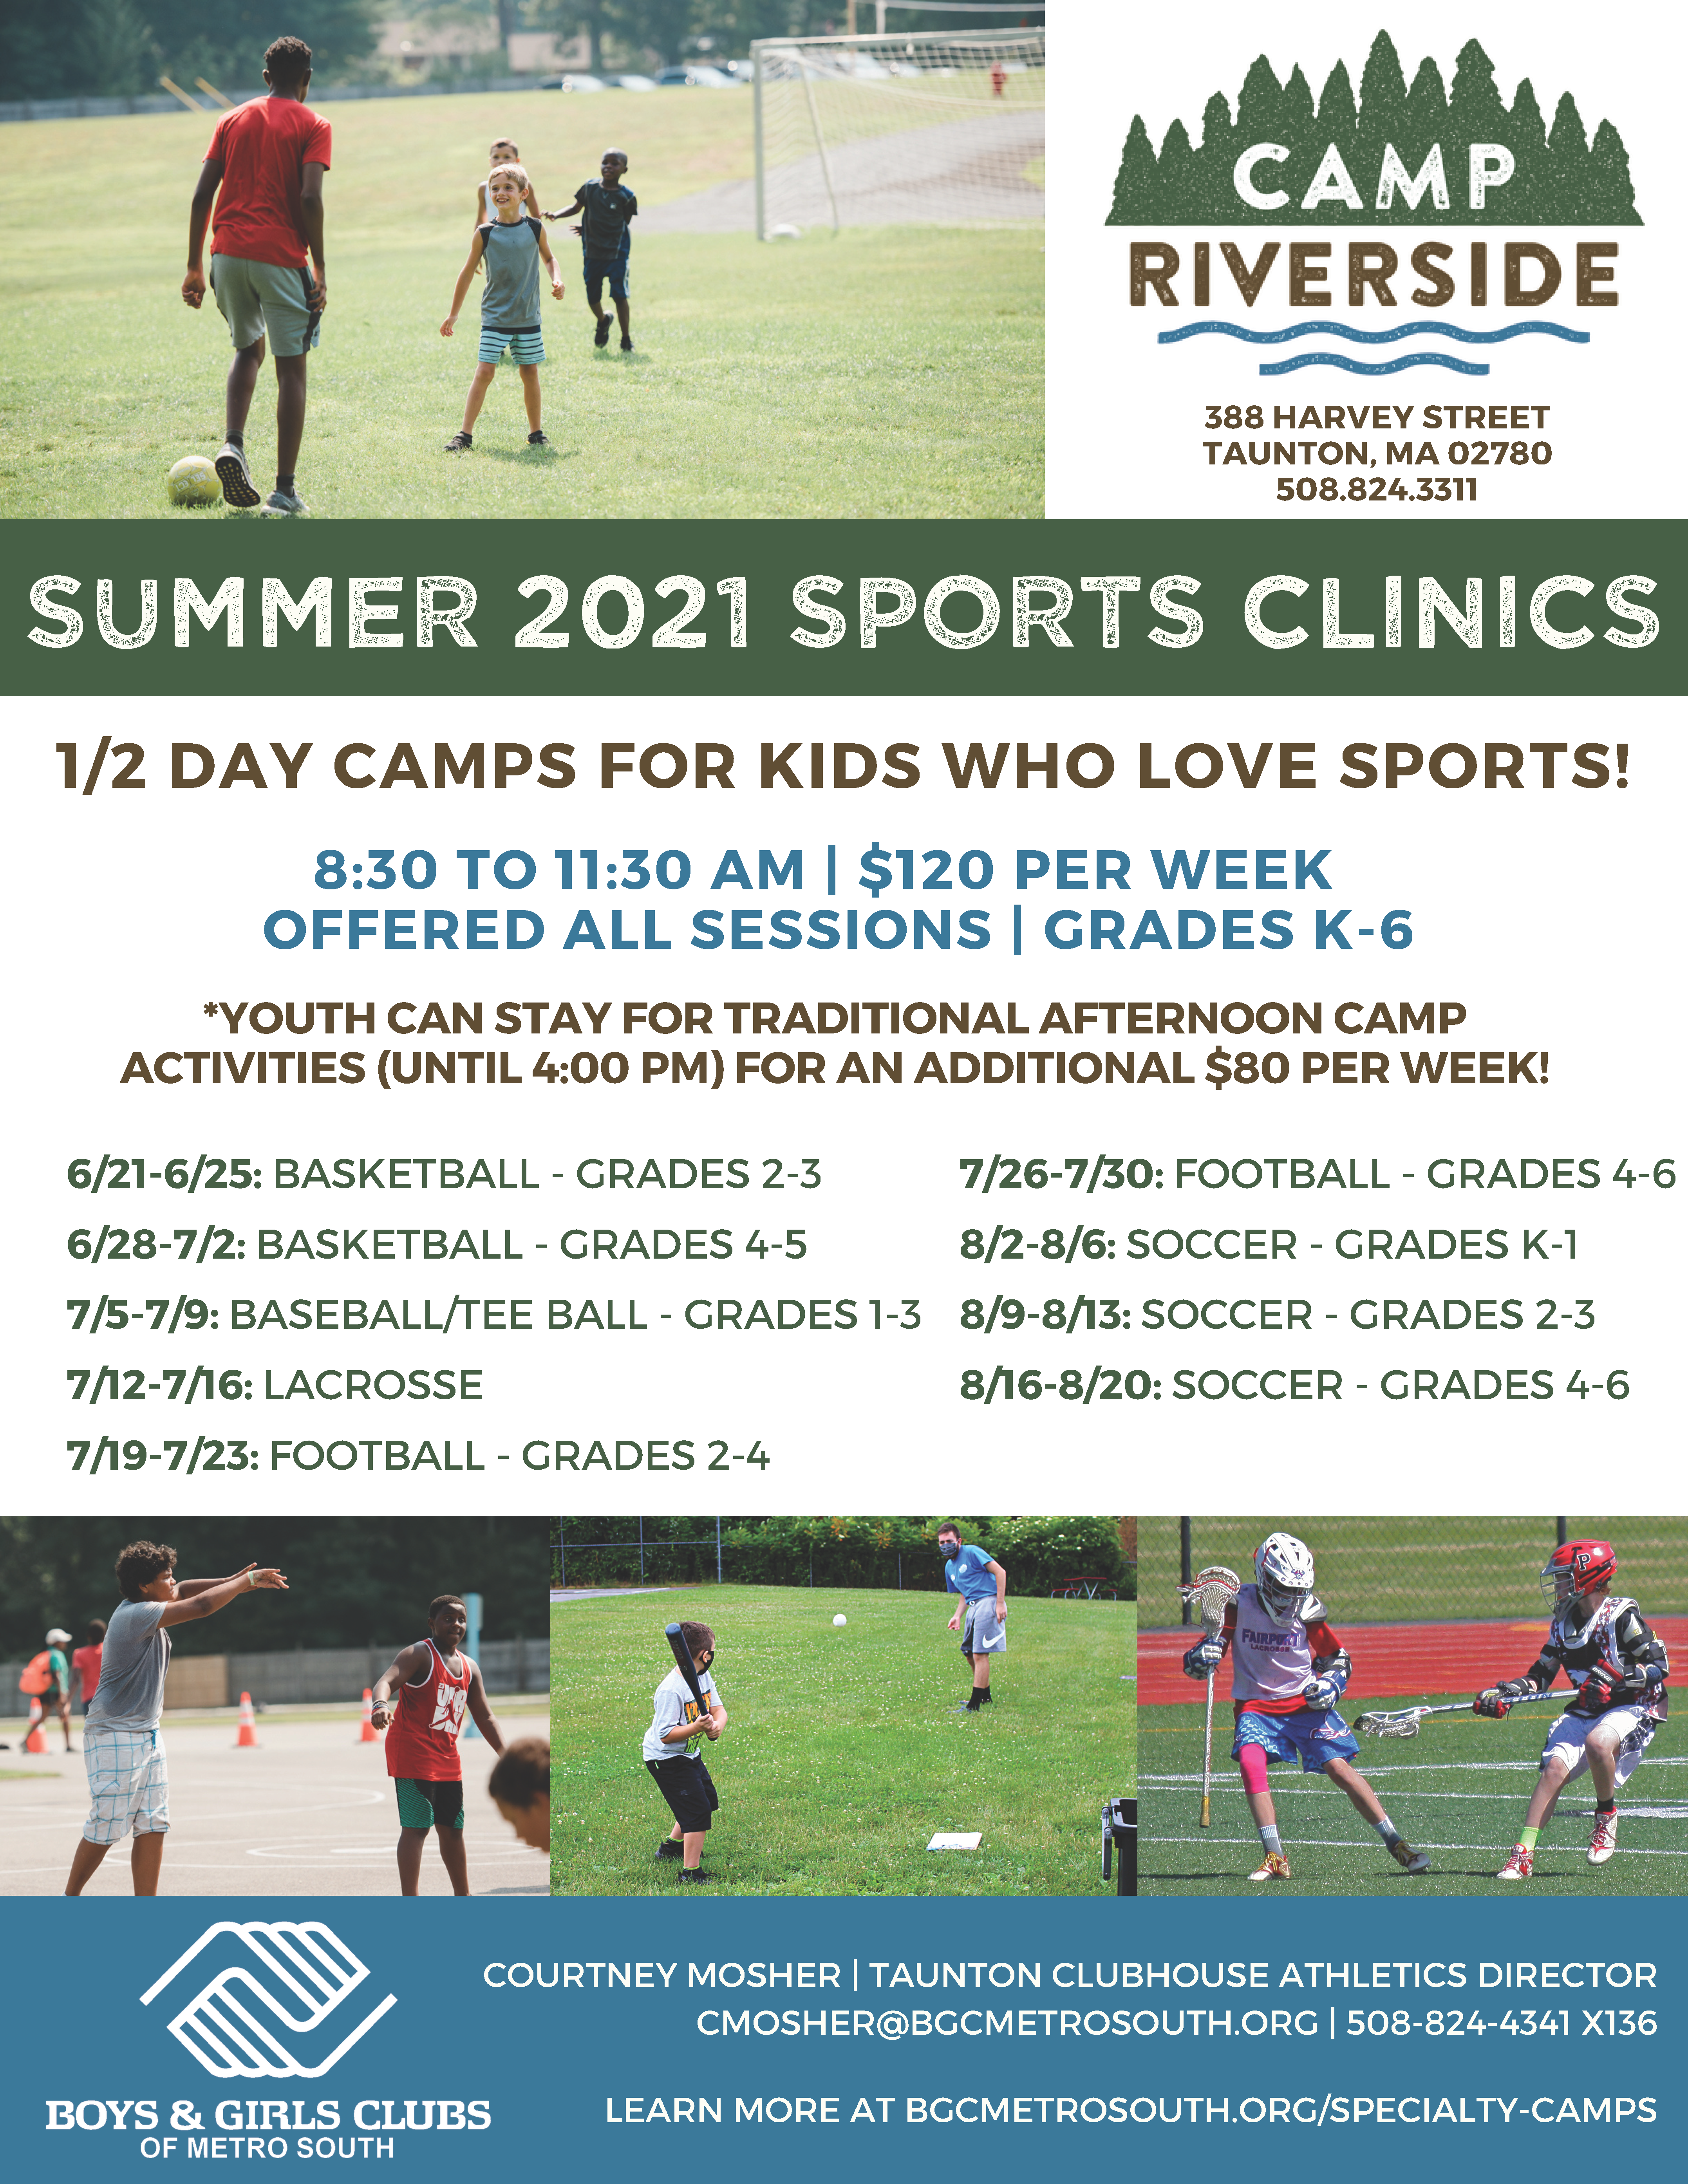 Camp Riverside Summer Sports Clinics